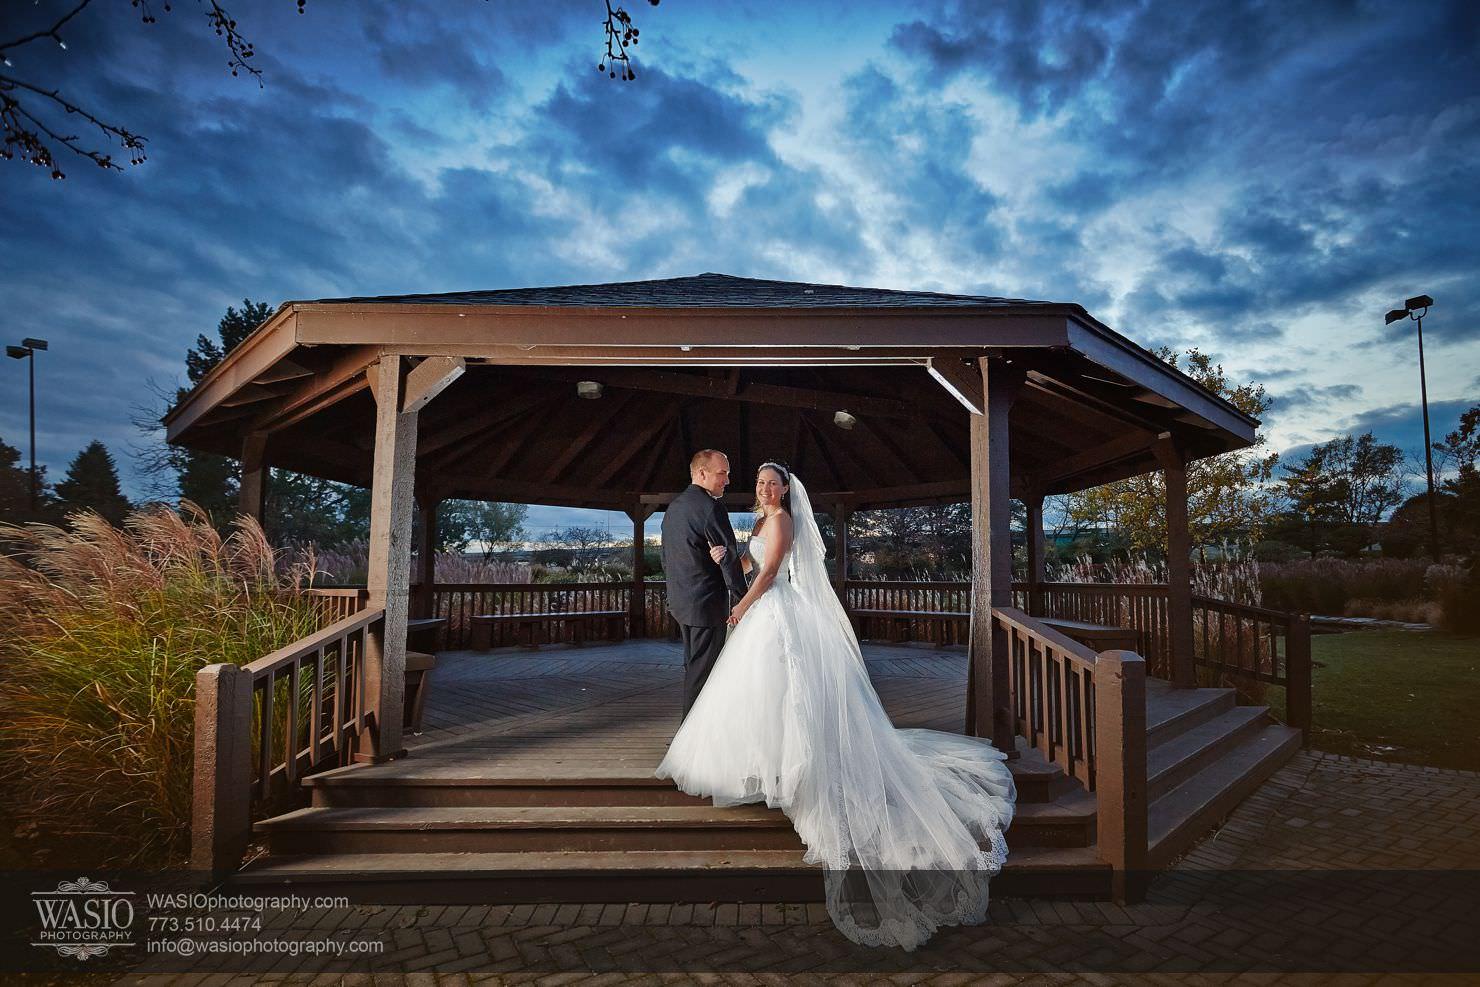 Rosemont-Fall-Wedding-Lauren-and-David-018 Rosemont Fall Wedding - Lauren + David